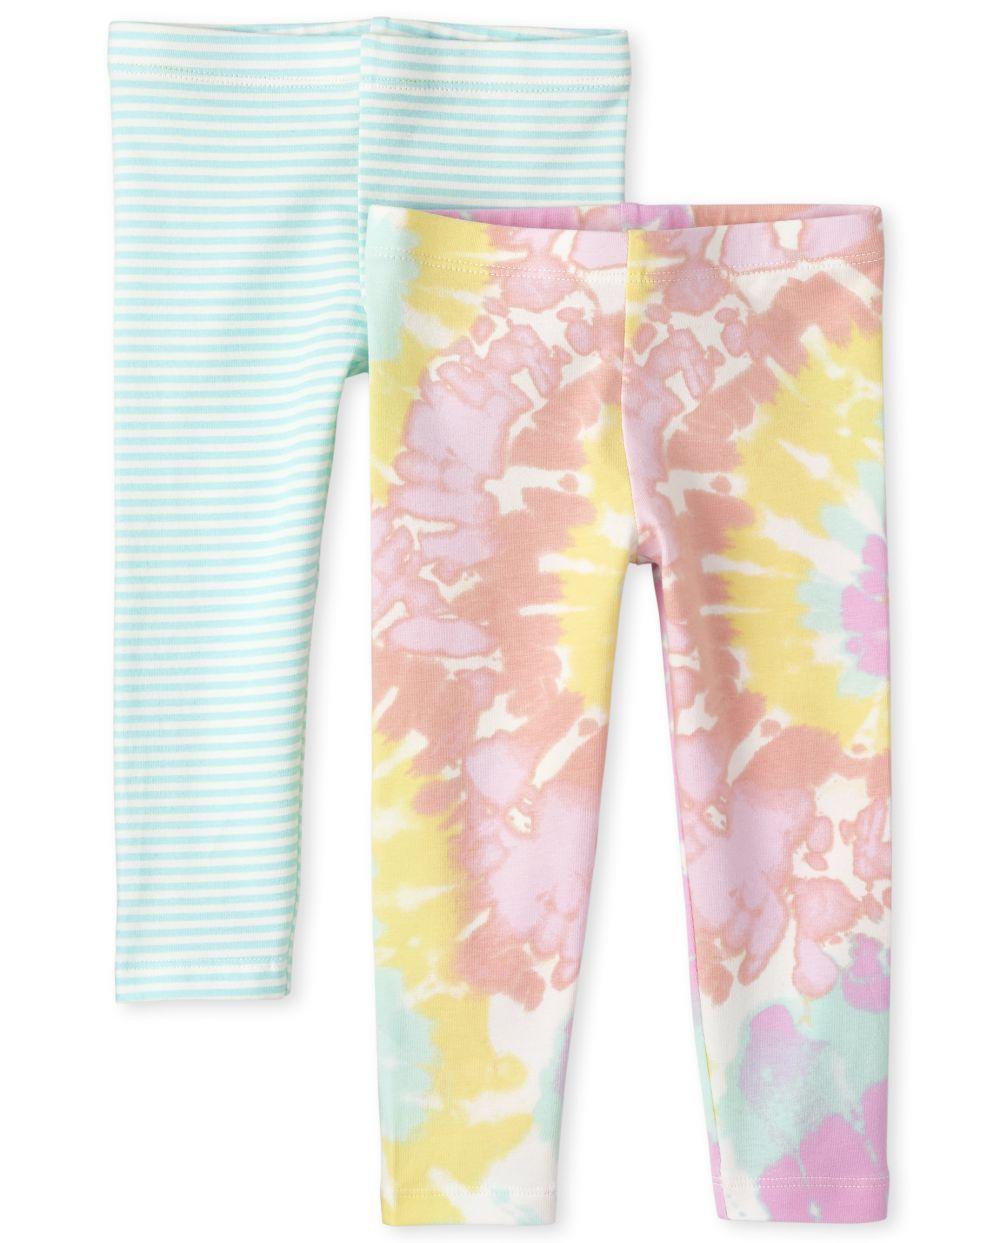 Paquete de 2 leggings con efecto tie dye para niñas pequeñas